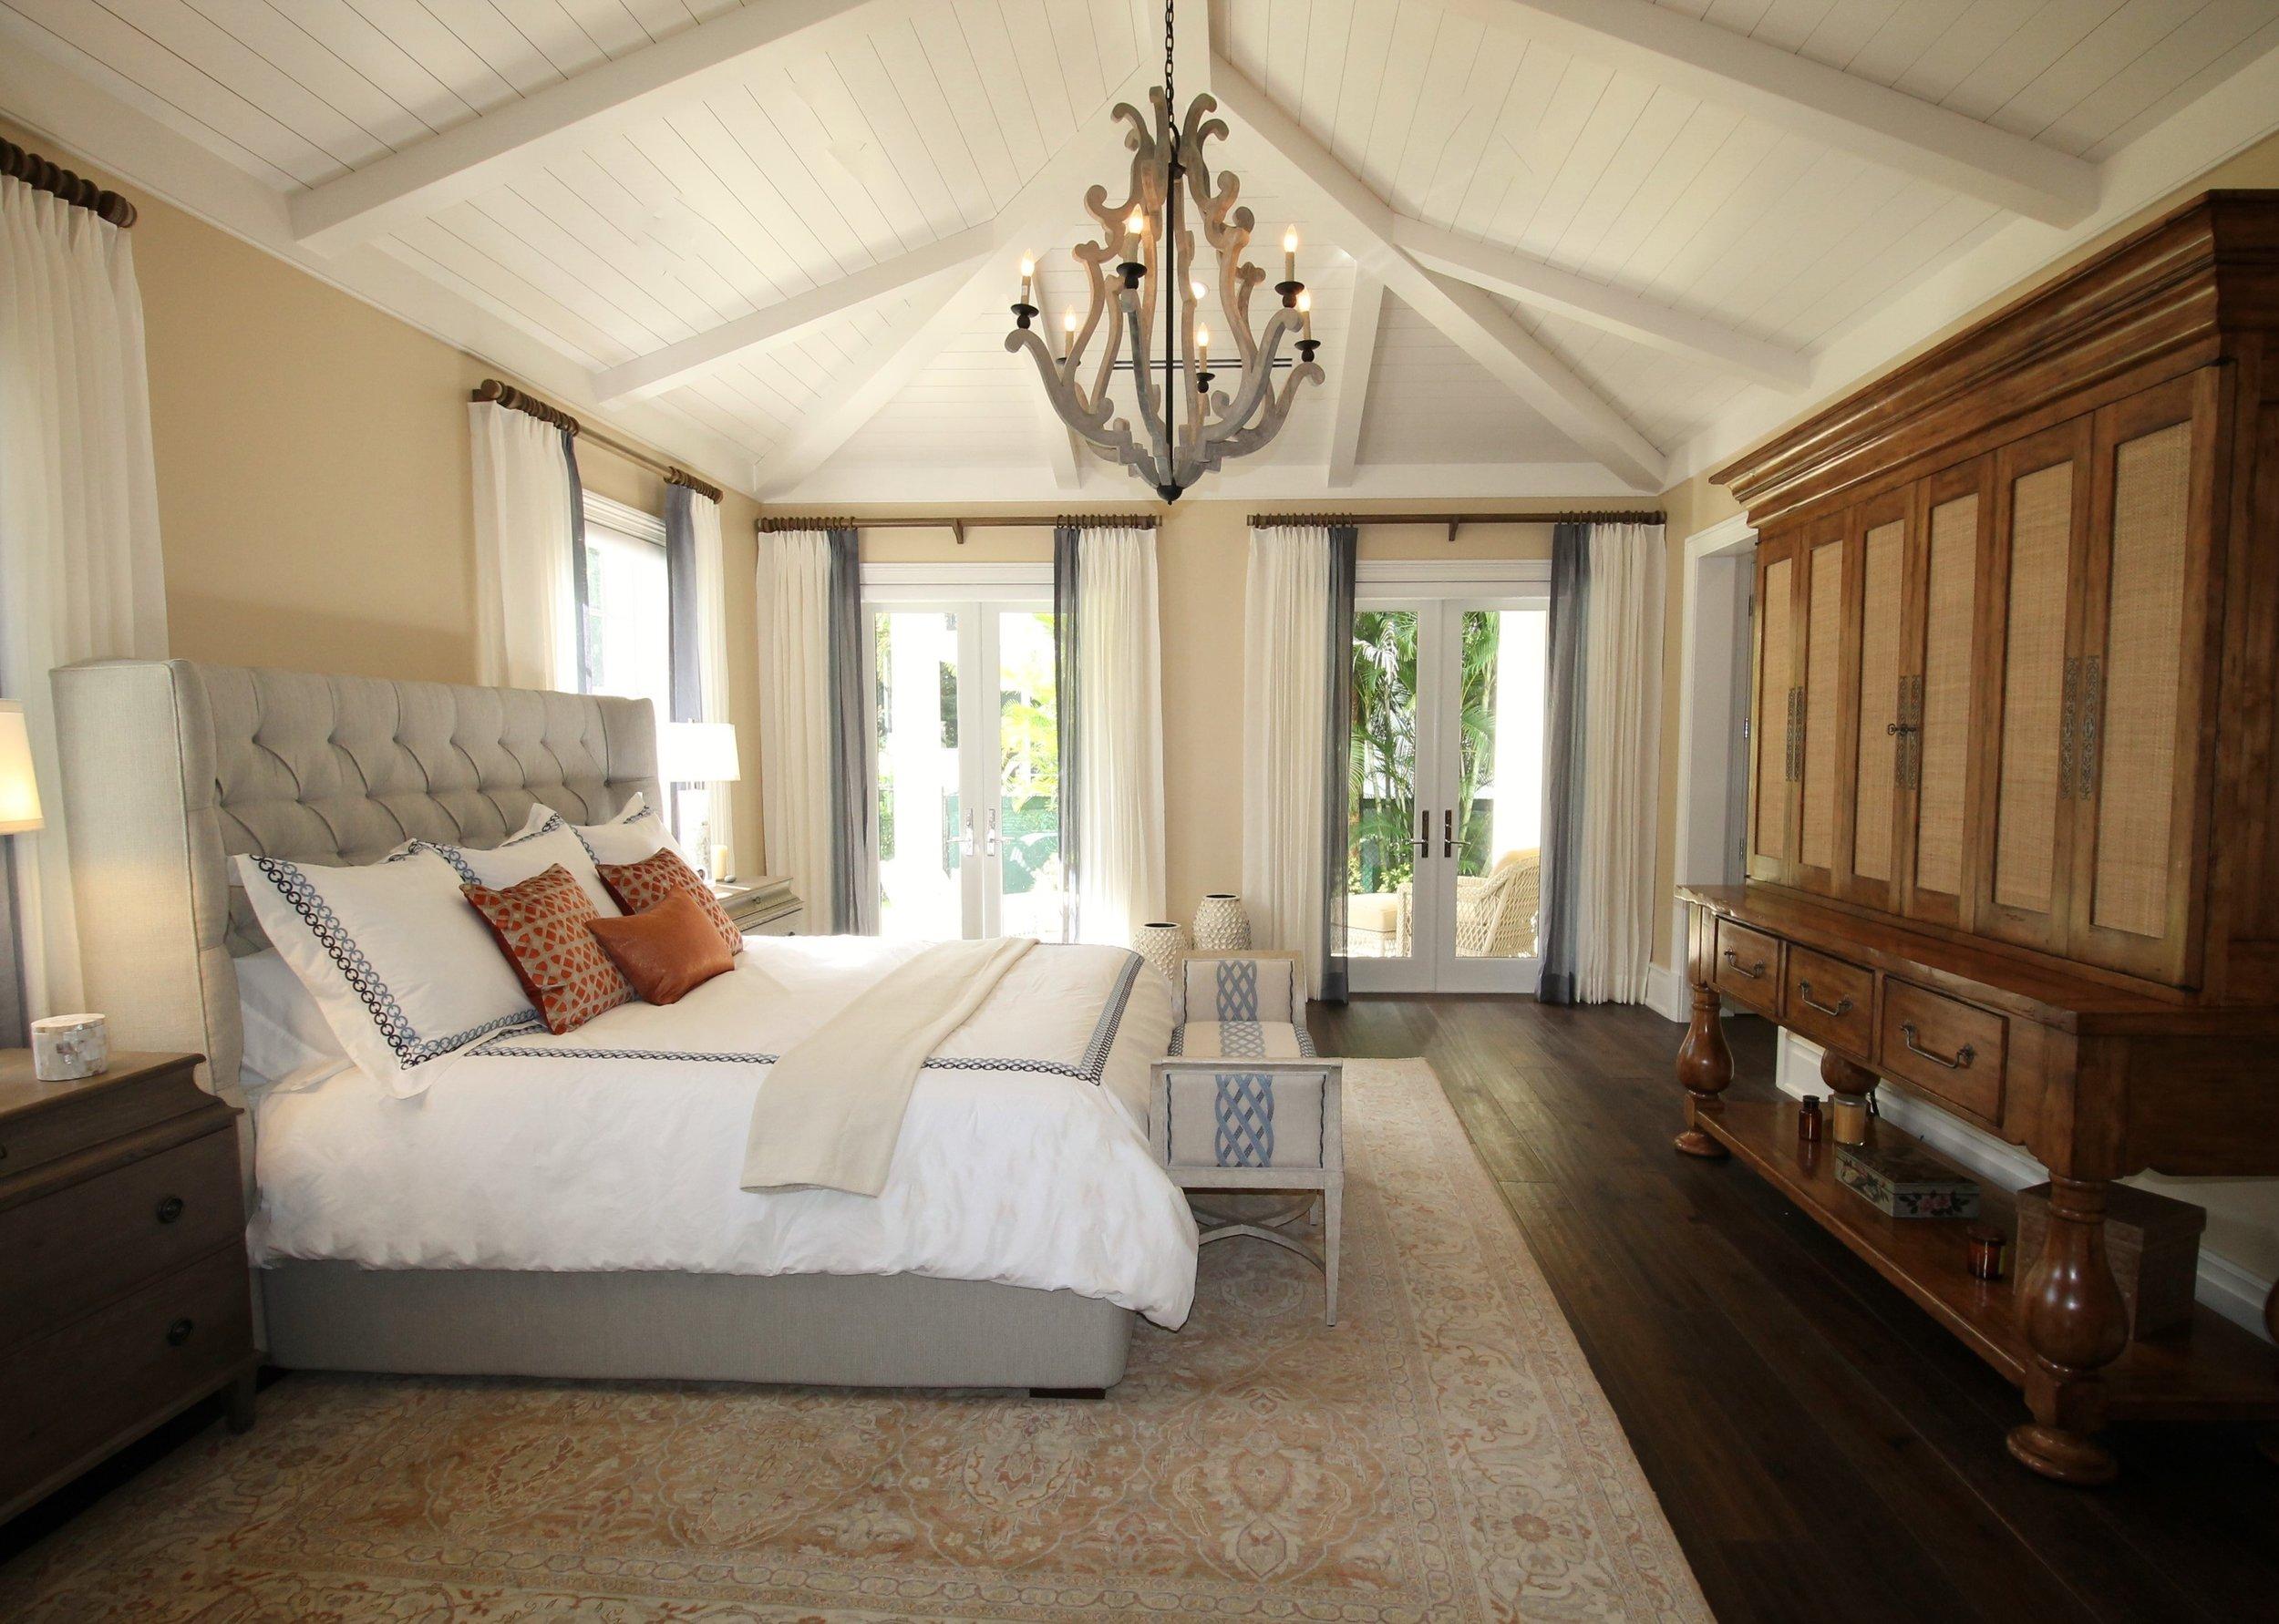 draperies, sheer shades, bedroom decor